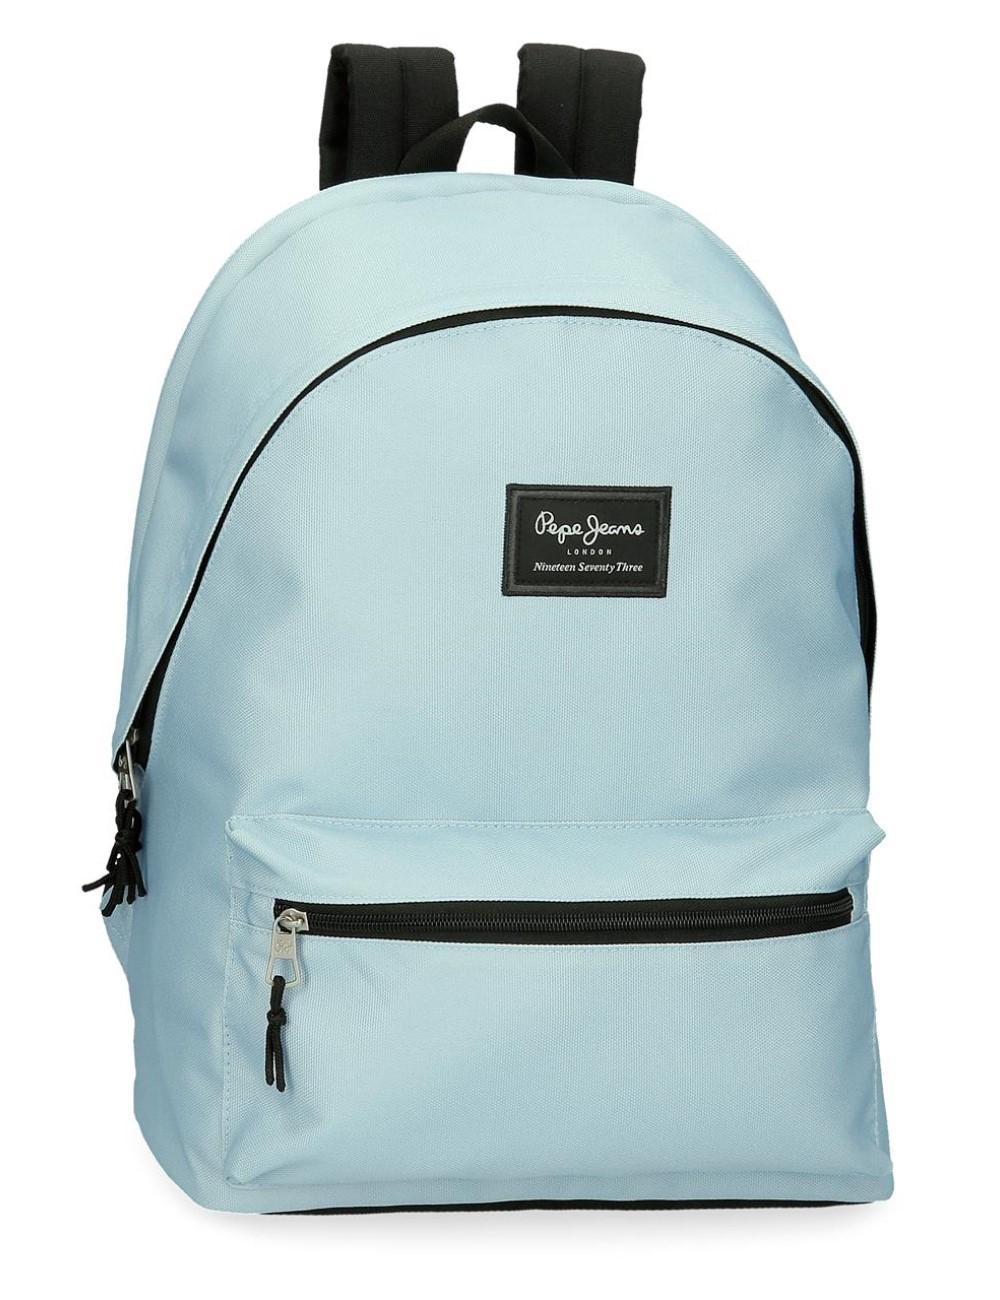 MochilaDoble Compartimento Portaordenador Pepe Jeans Aris Azul Claro 6322428